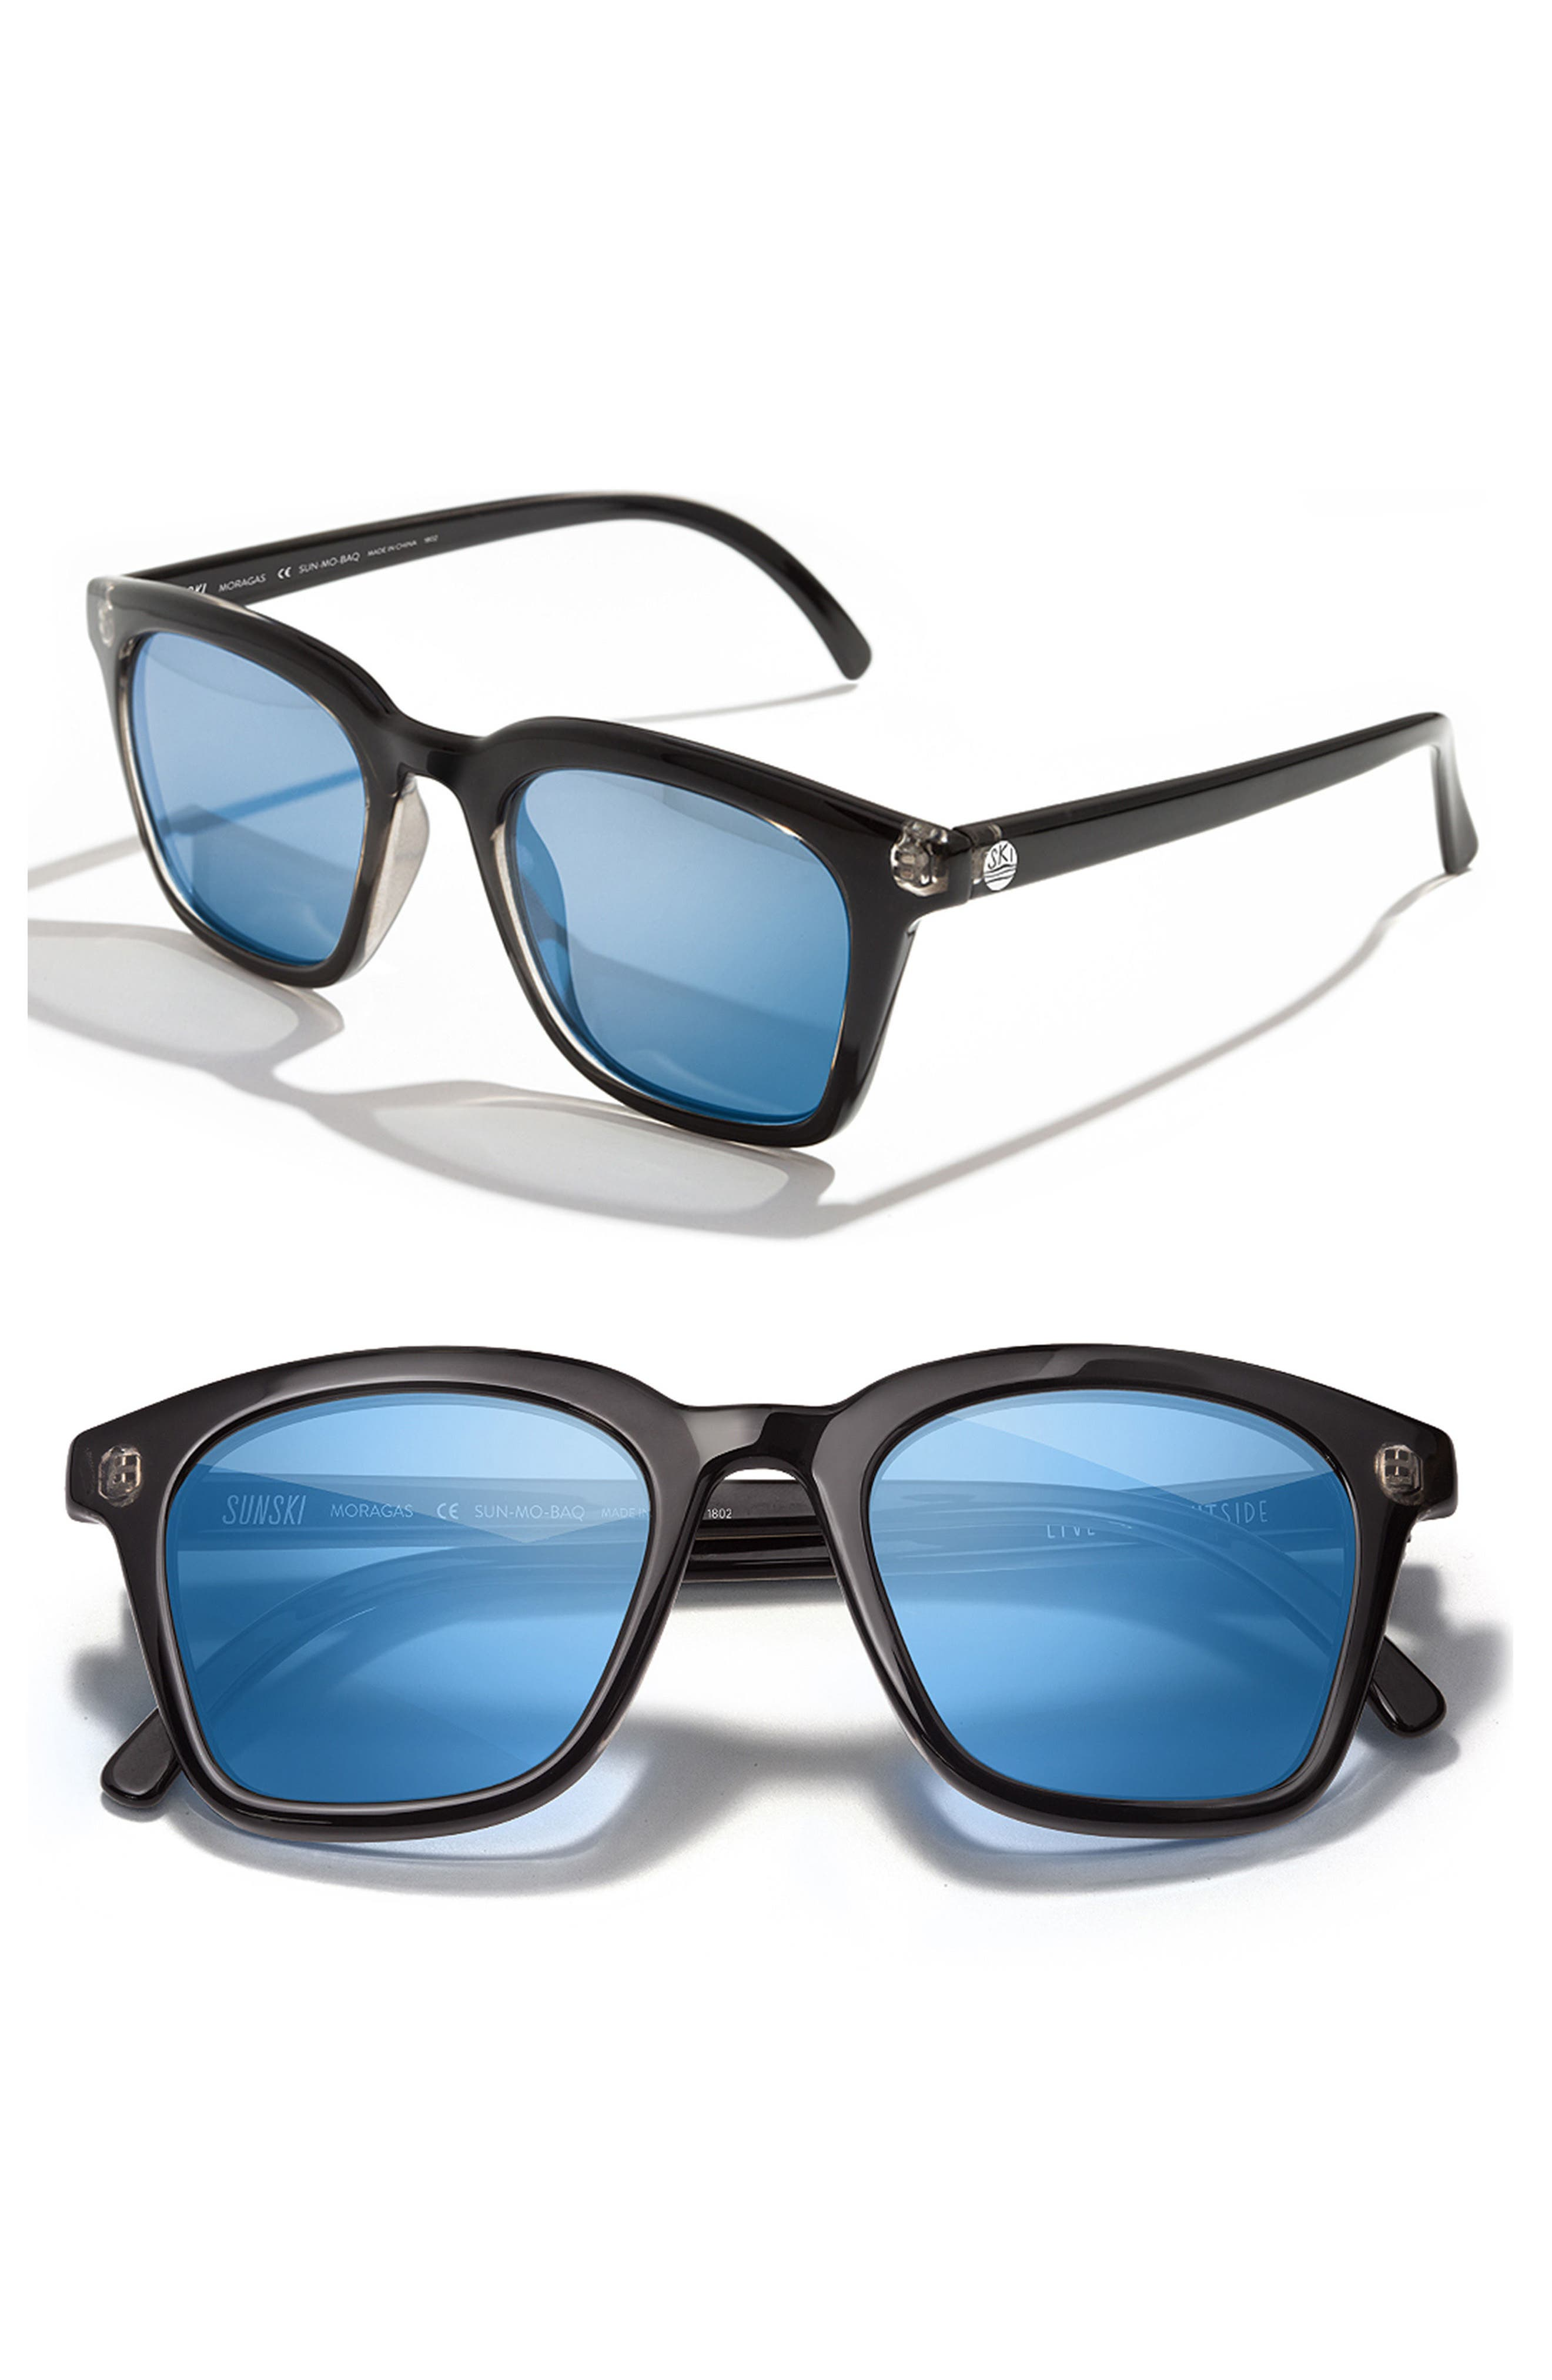 Moraga 47mm Polarized Sunglasses,                             Main thumbnail 1, color,                             Black Aqua